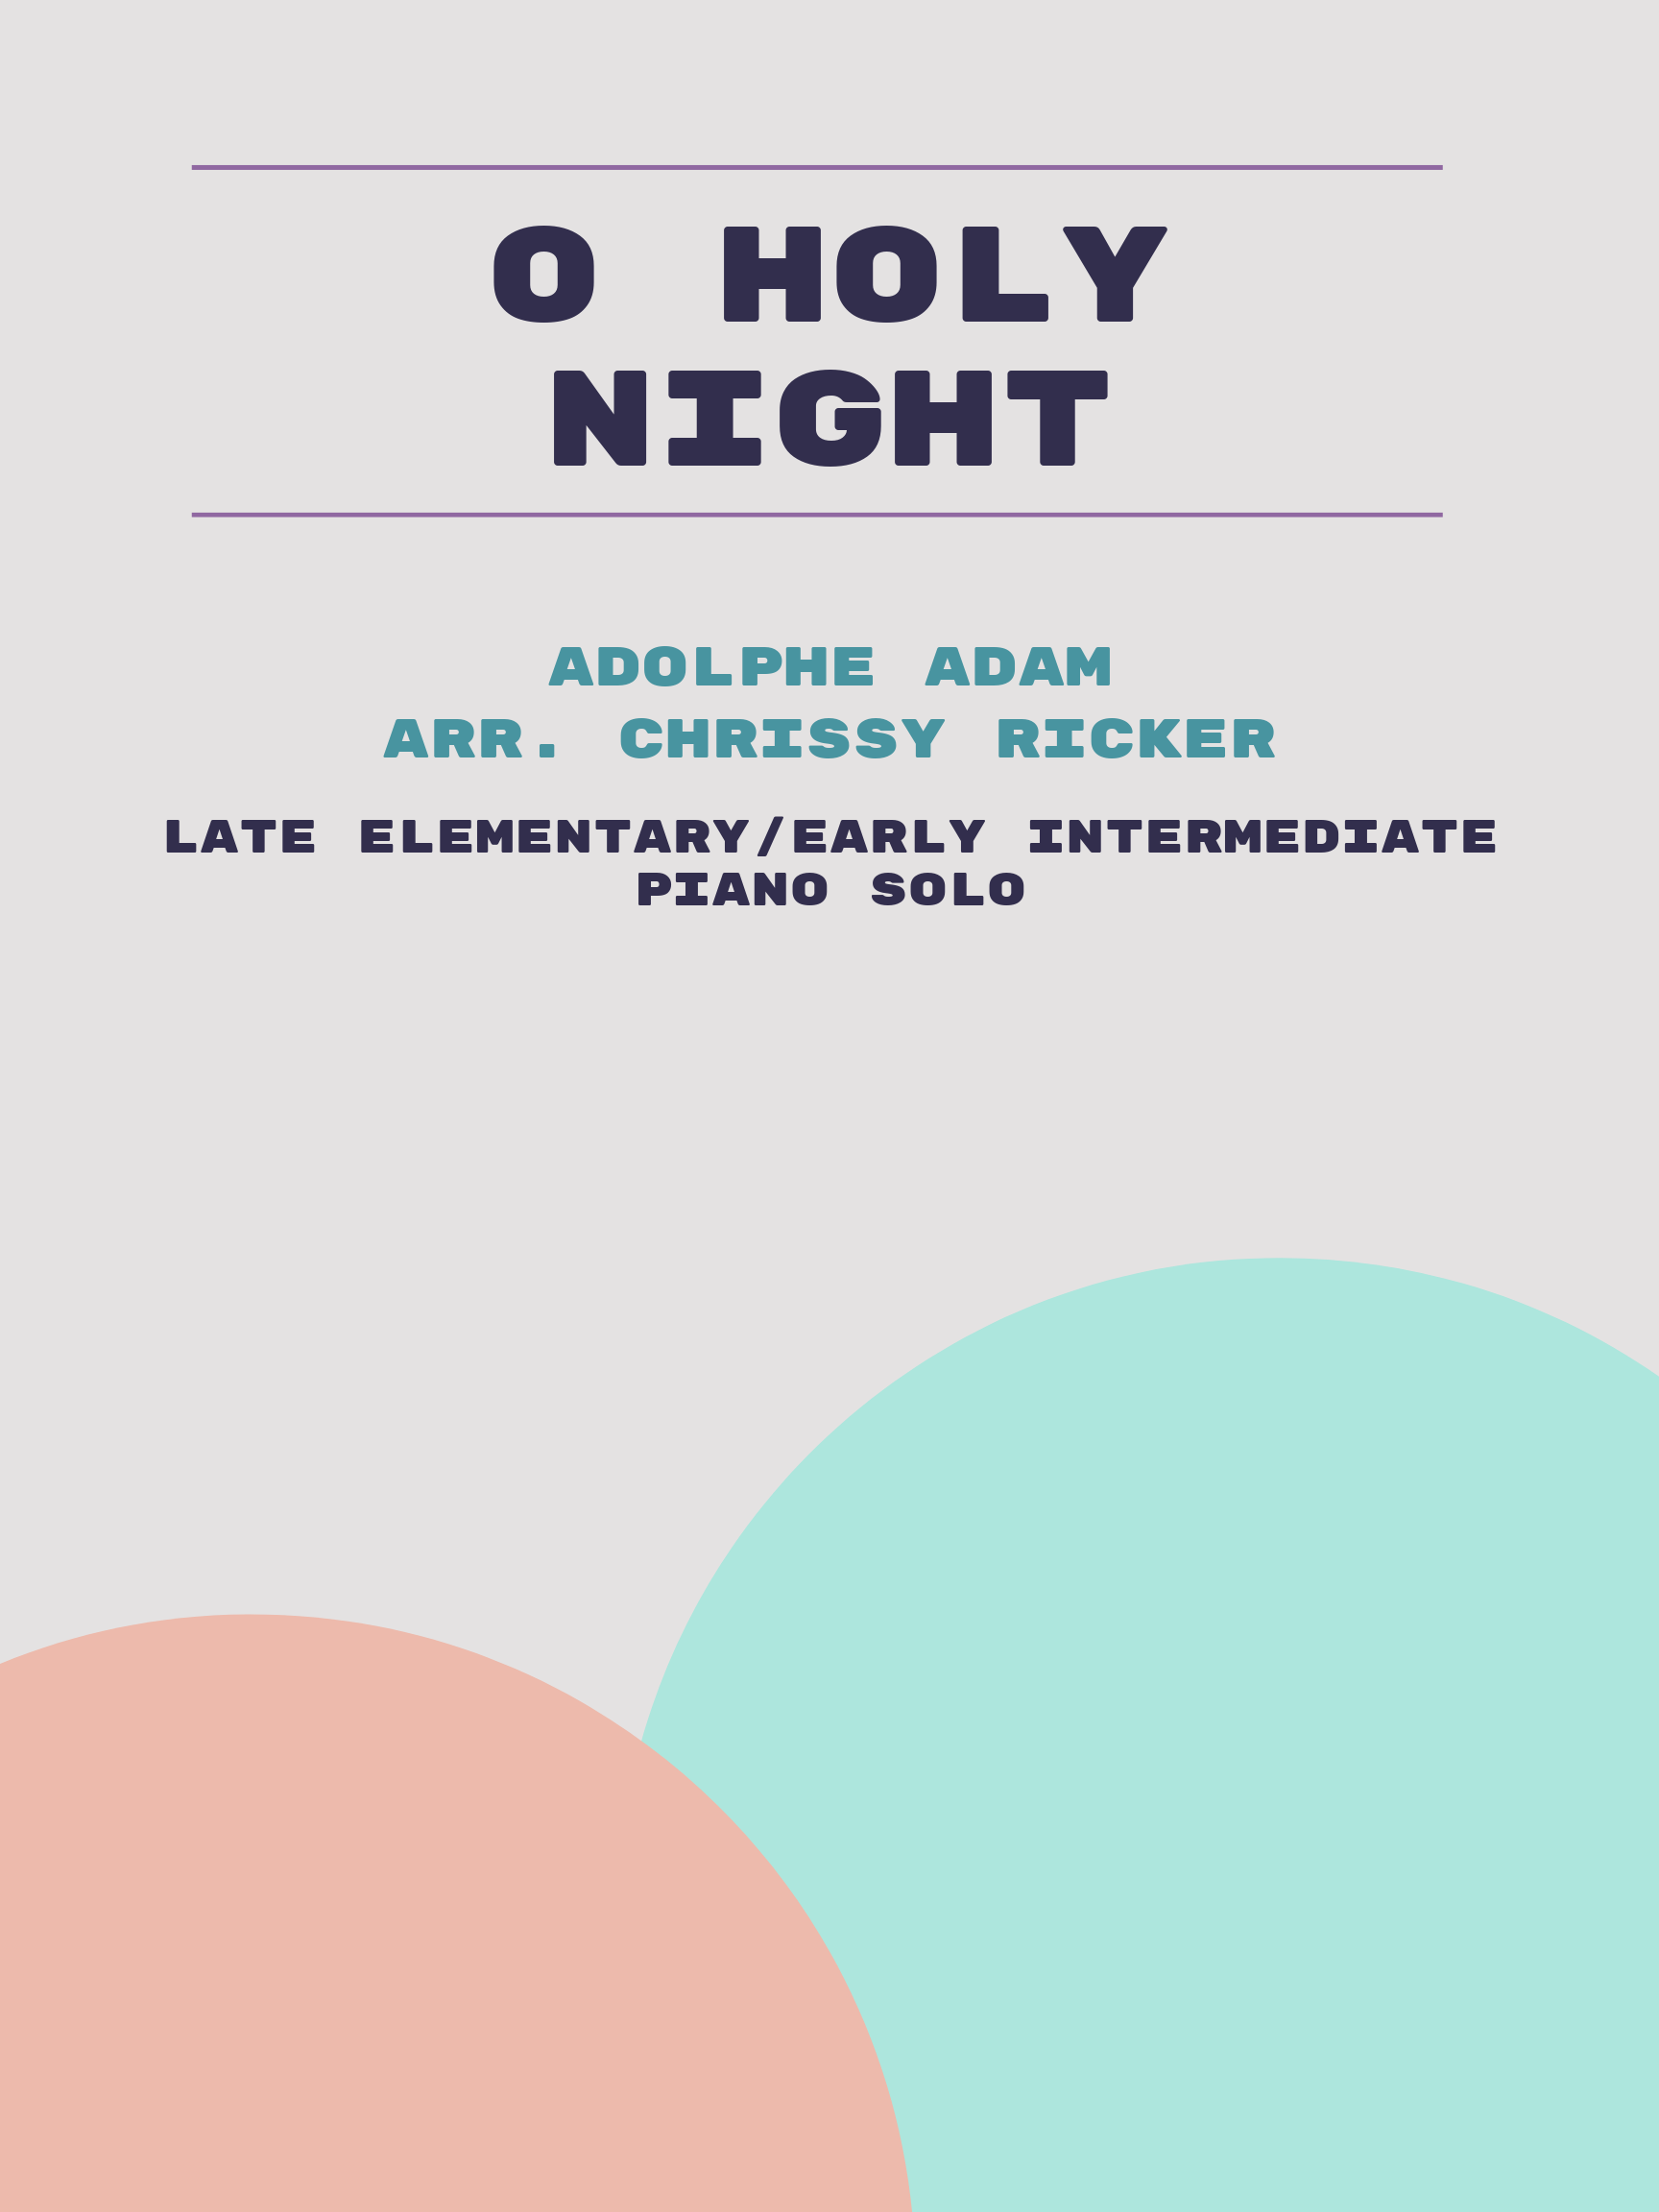 O Holy Night by Adolphe Adam